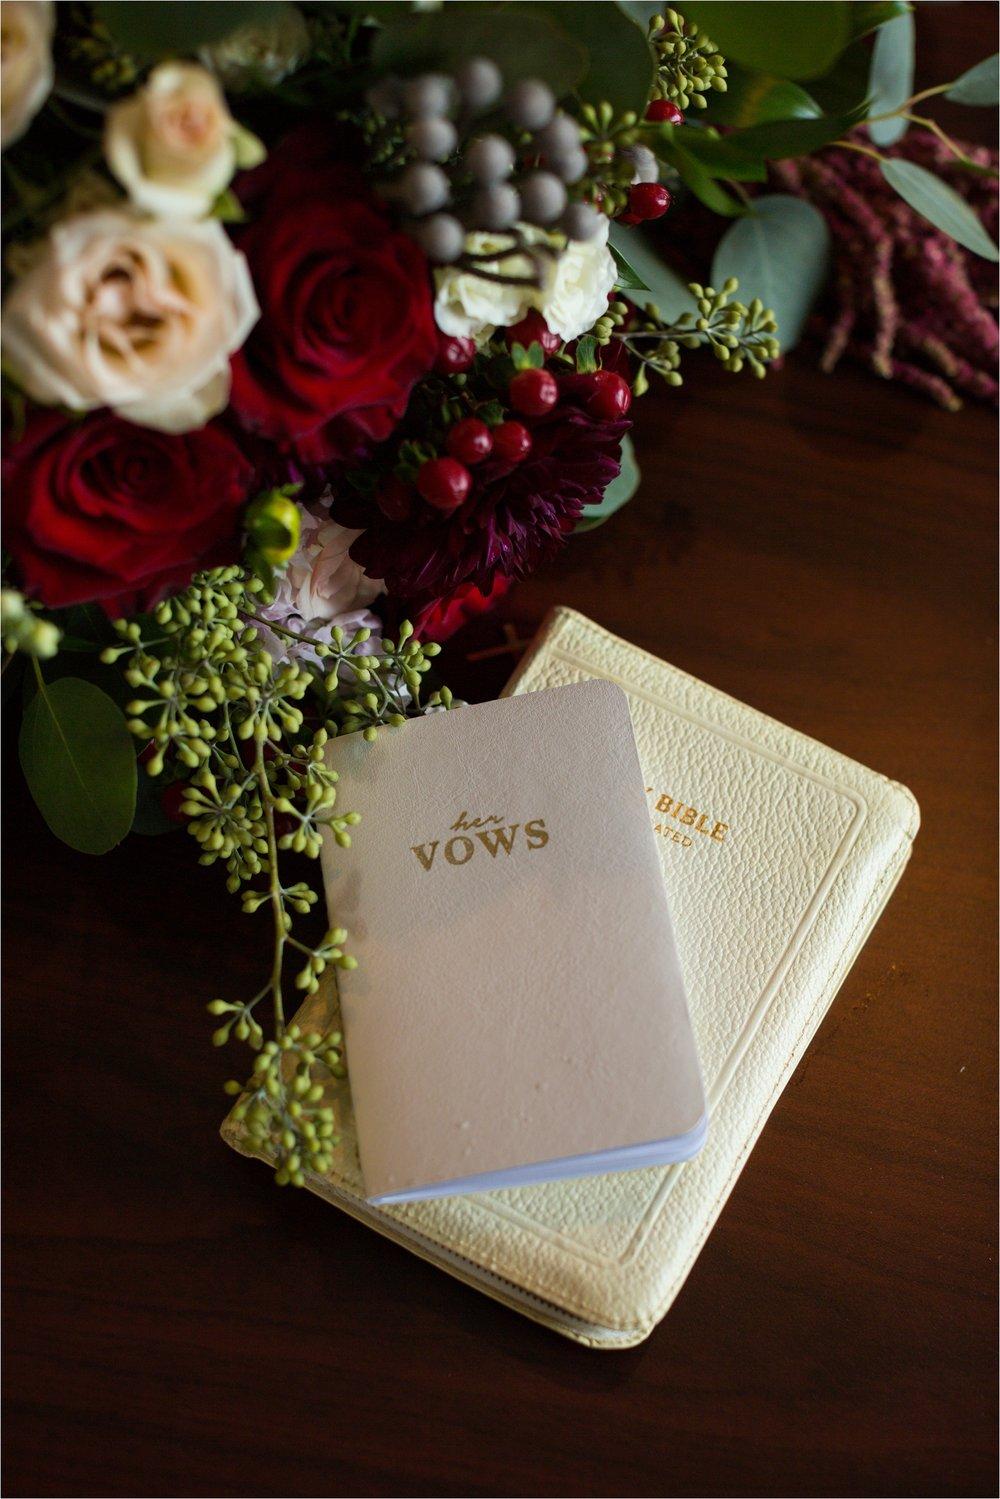 Feather-and-Oak-Photography-Cross-Keys-Vineyard-Wedding-0641.jpg